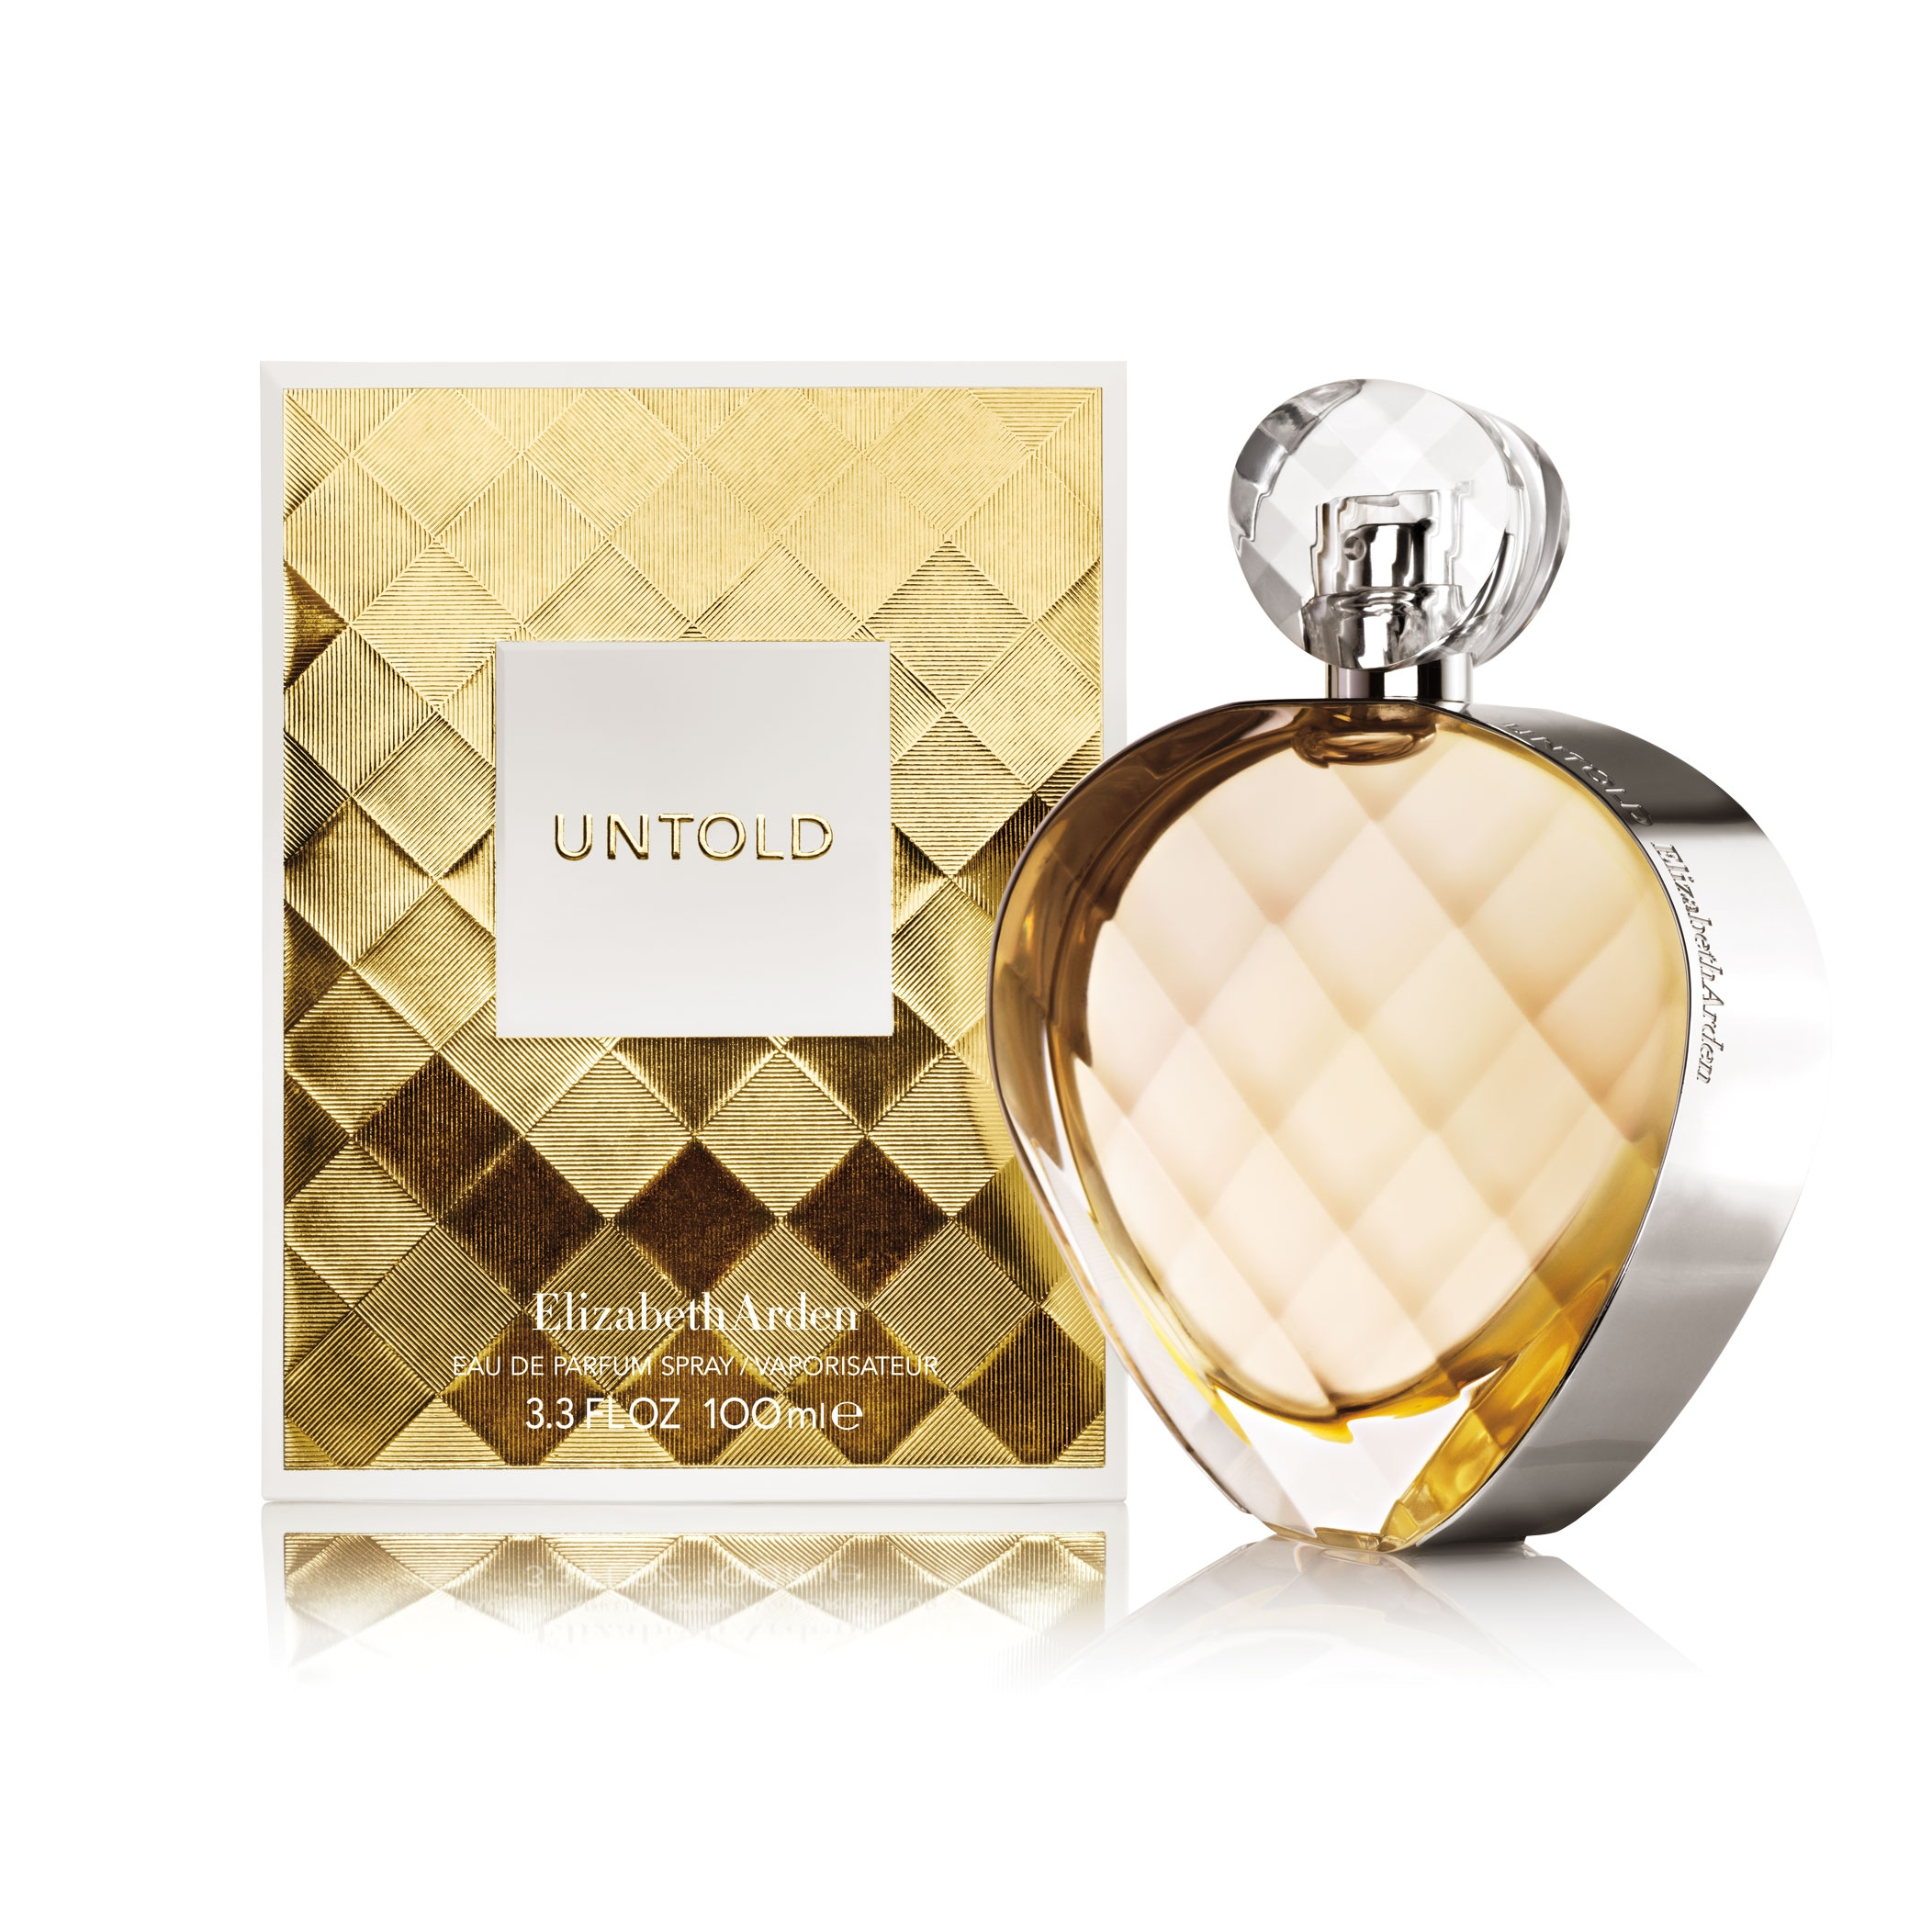 Elizabeth Arden Untold Perfume Spray Fragrance Master Cologne Black Musk